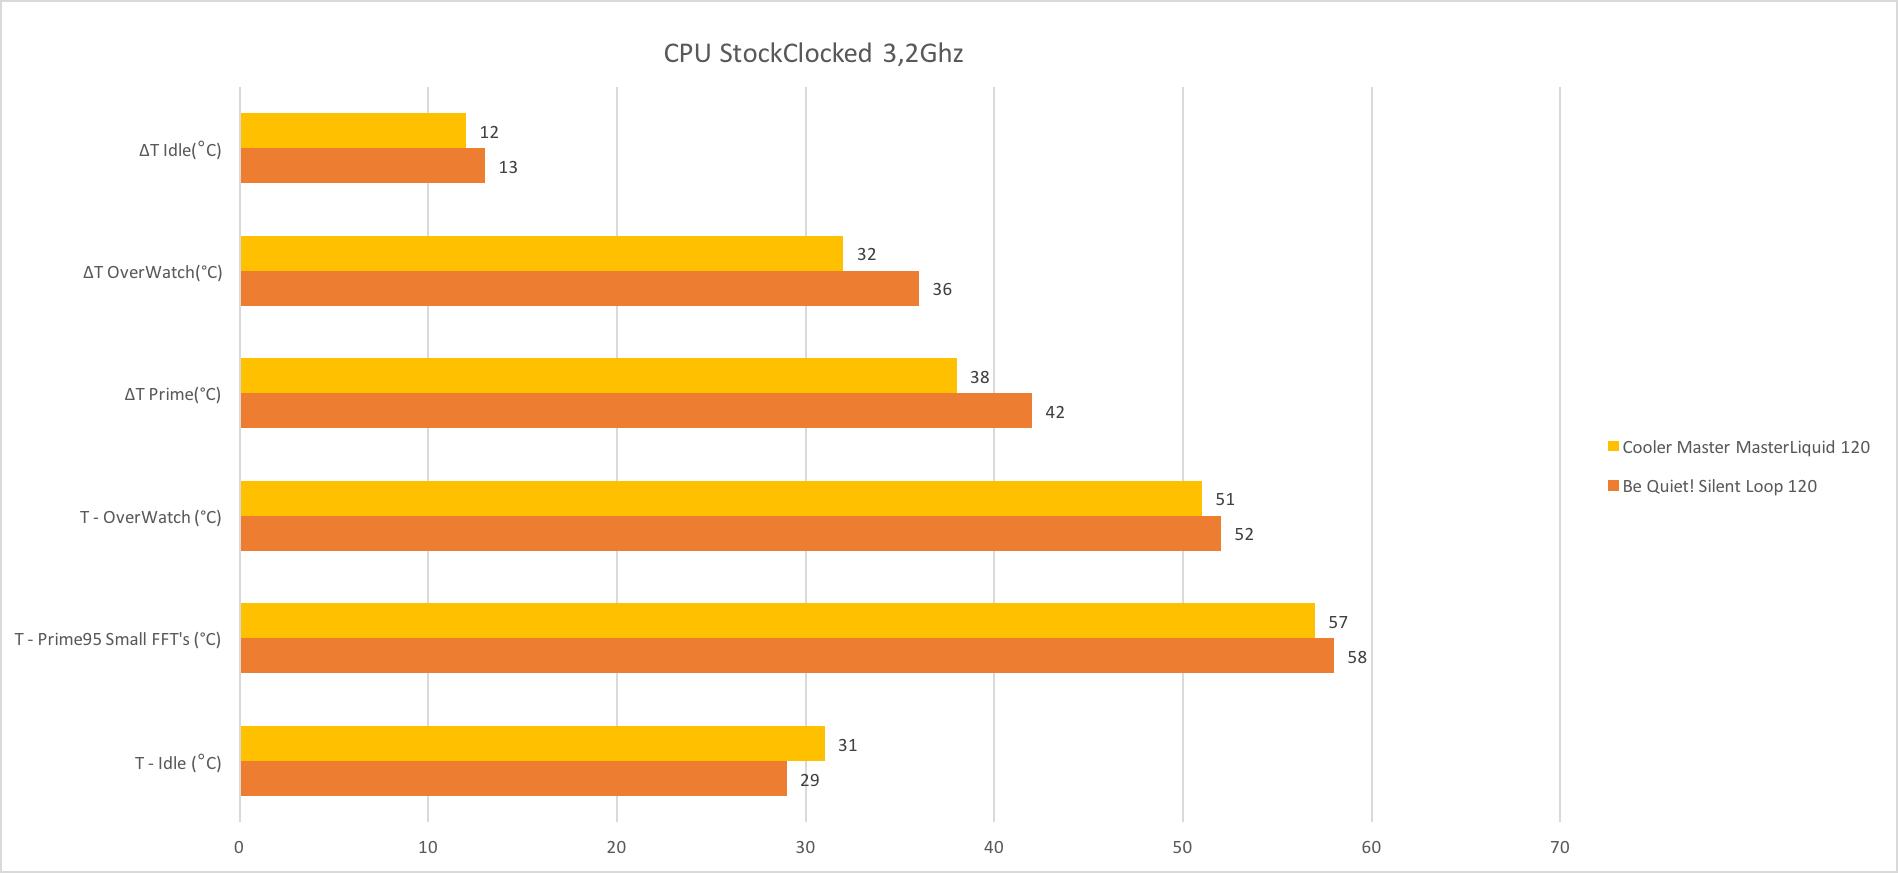 CPU koeler benchmark - Stock - Cooler Master MasterLiquid120